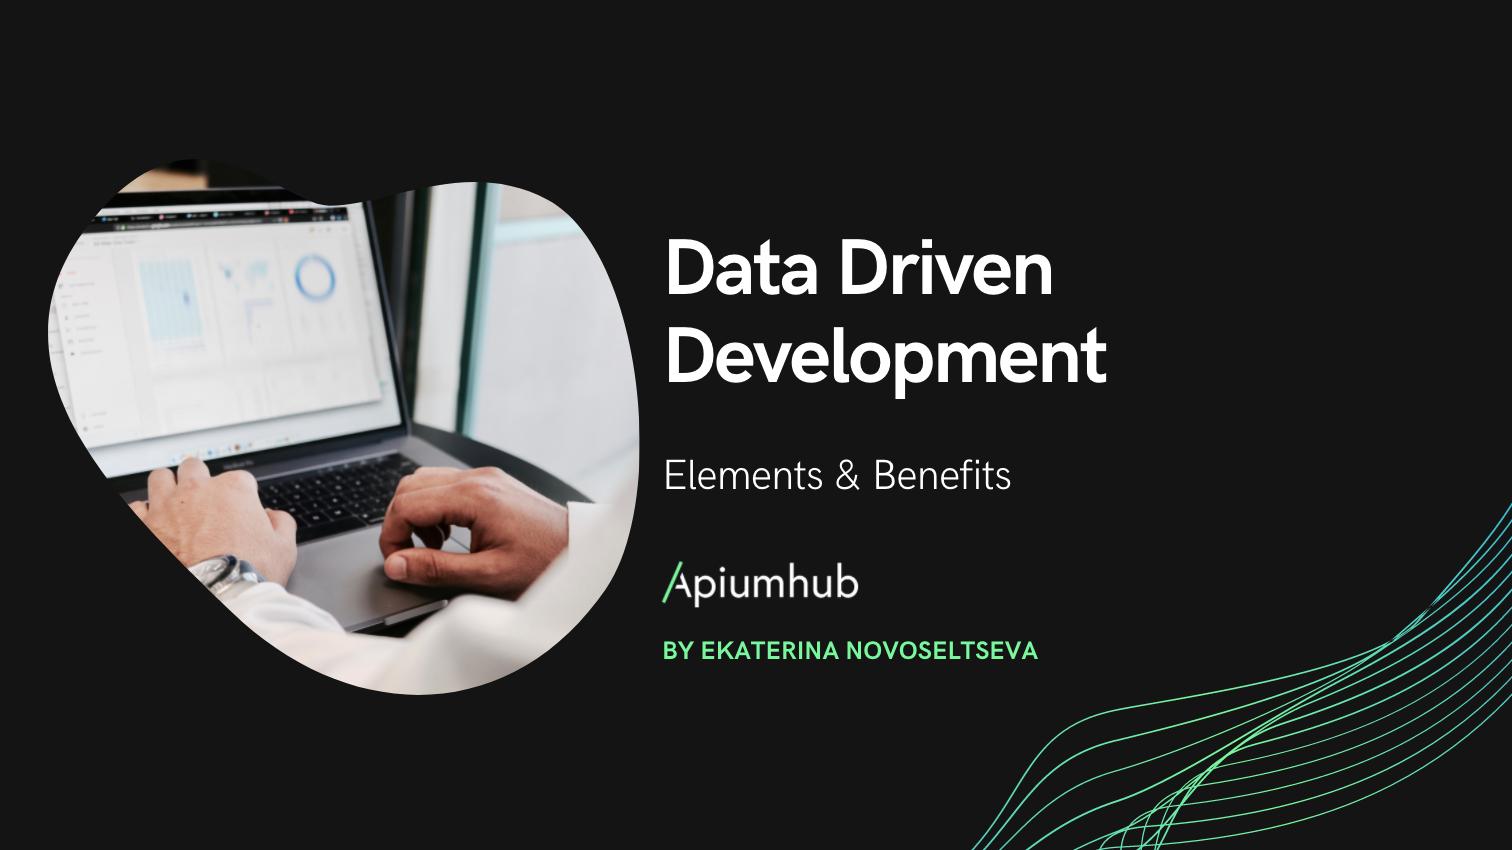 Data Driven Development Elements & Benefits